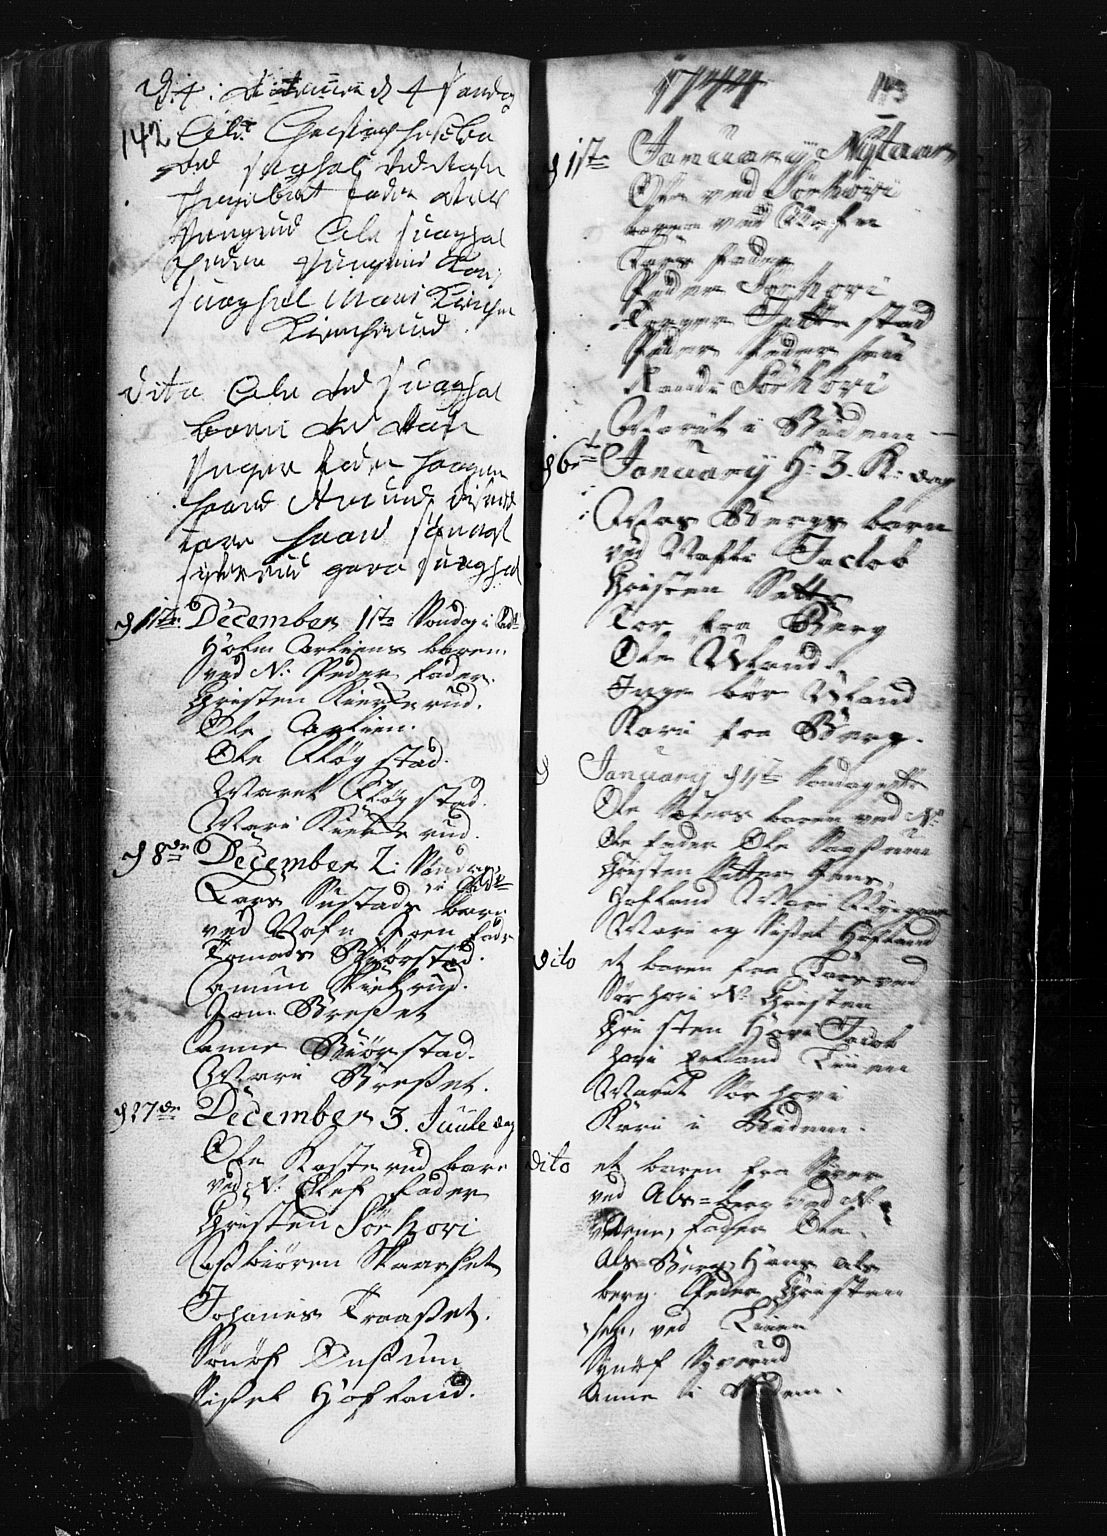 SAH, Fåberg prestekontor, Klokkerbok nr. 1, 1727-1767, s. 142-143